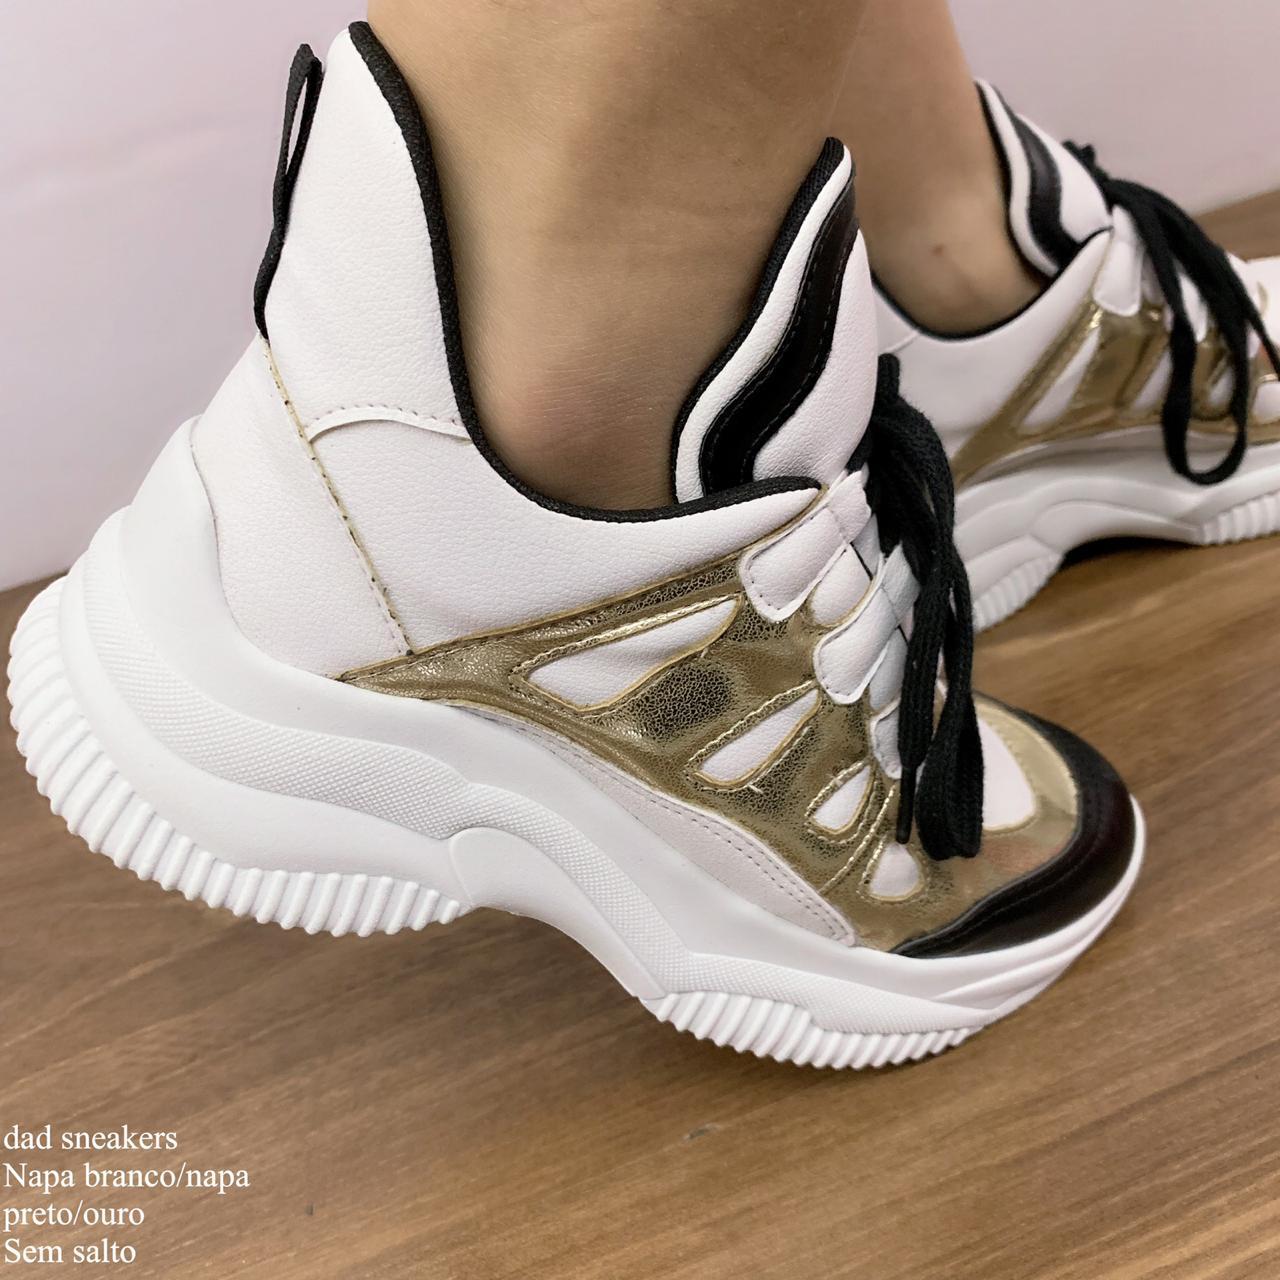 Tênis DAD Sneakers Branco Napa Preto Napa OURO | D-380 D